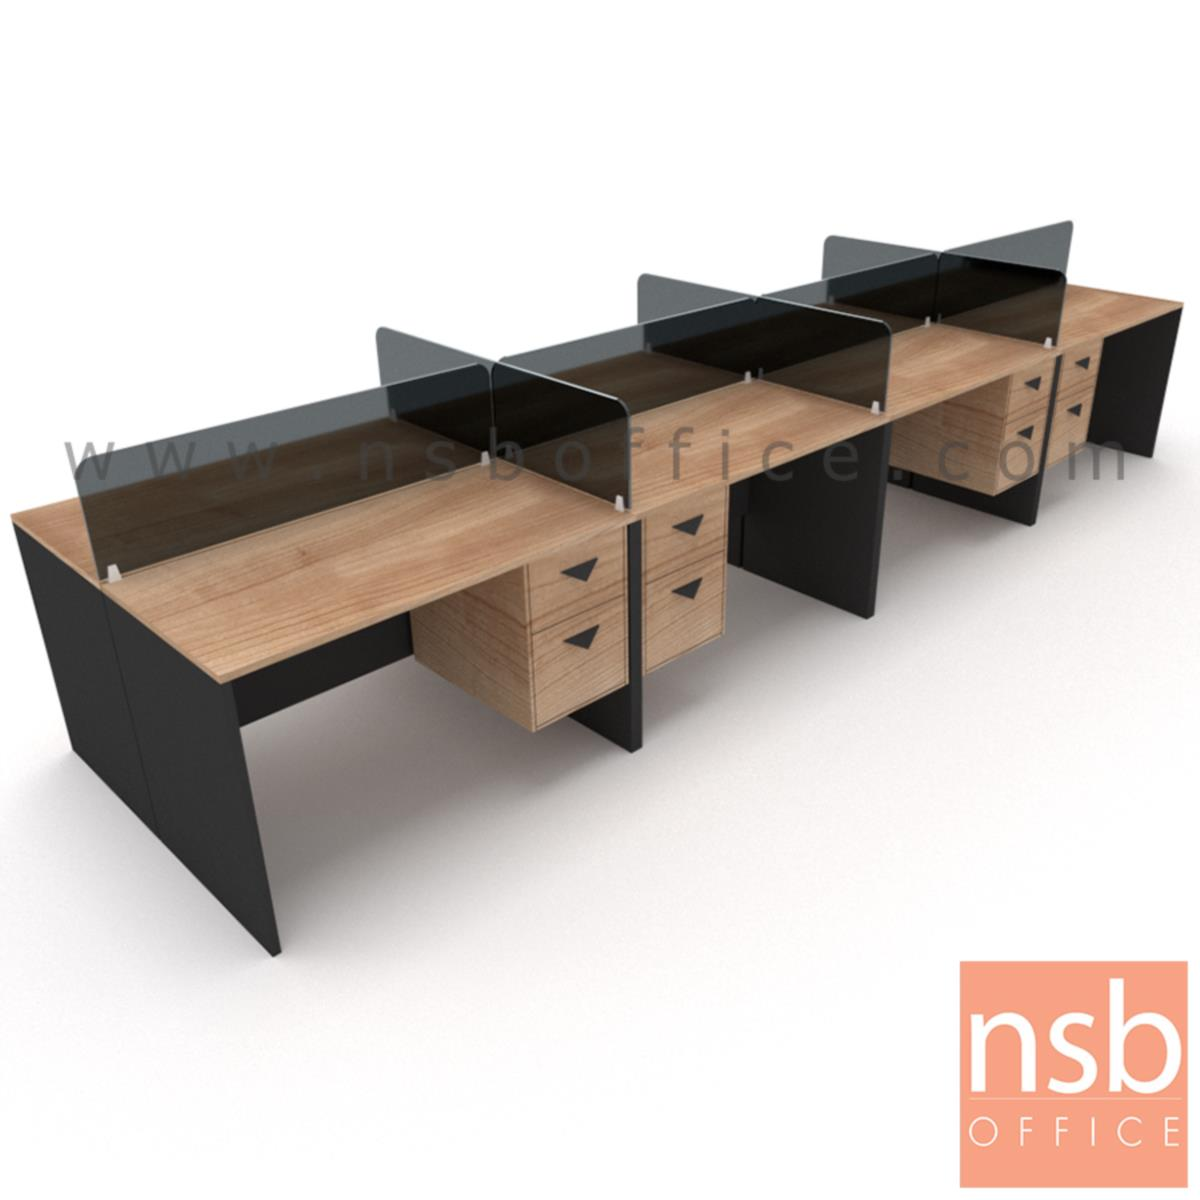 A04A168:ชุดโต๊ะทำงานกลุ่ม   4 ,6 ที่นั่ง ขนาด 240W ,360W cm.  พร้อมมินิสกรีนกระจกฝ้าและ 2 ลิ้นชักข้าง